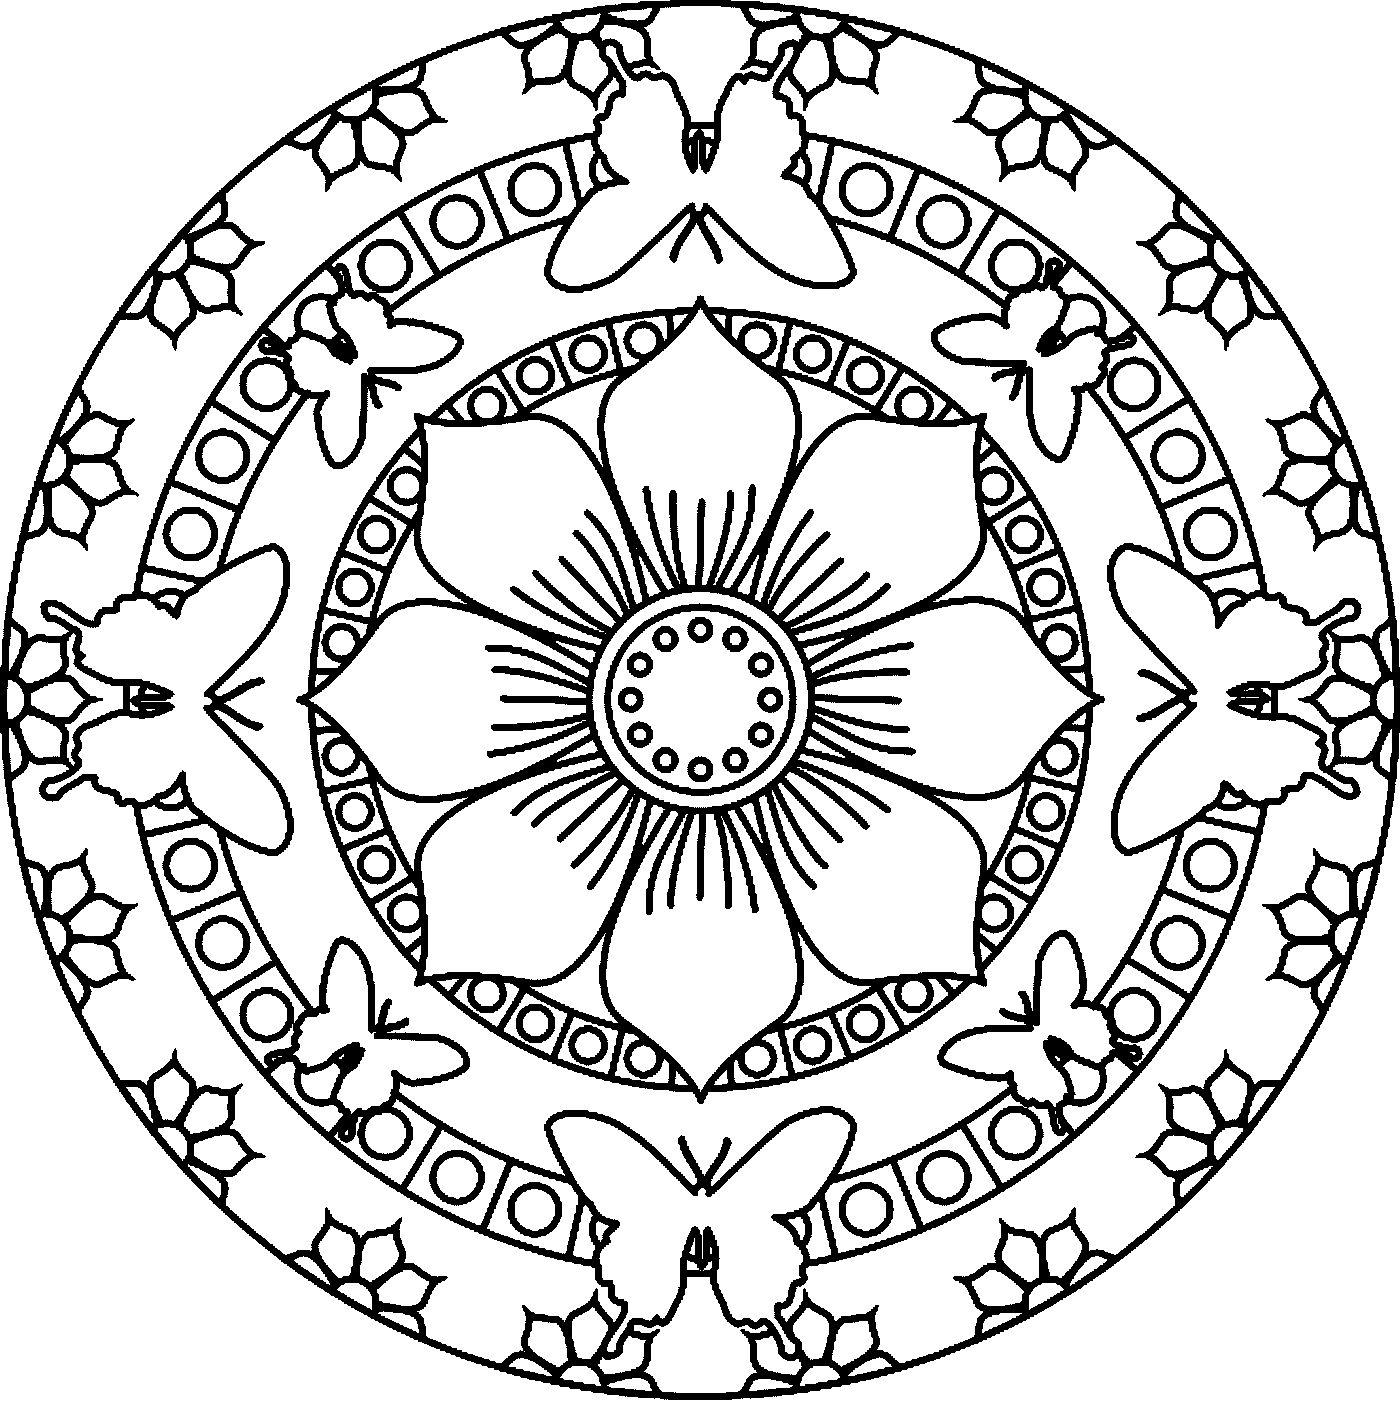 1400x1416 Simple Mandala Coloring Pages Printable Download Coloring